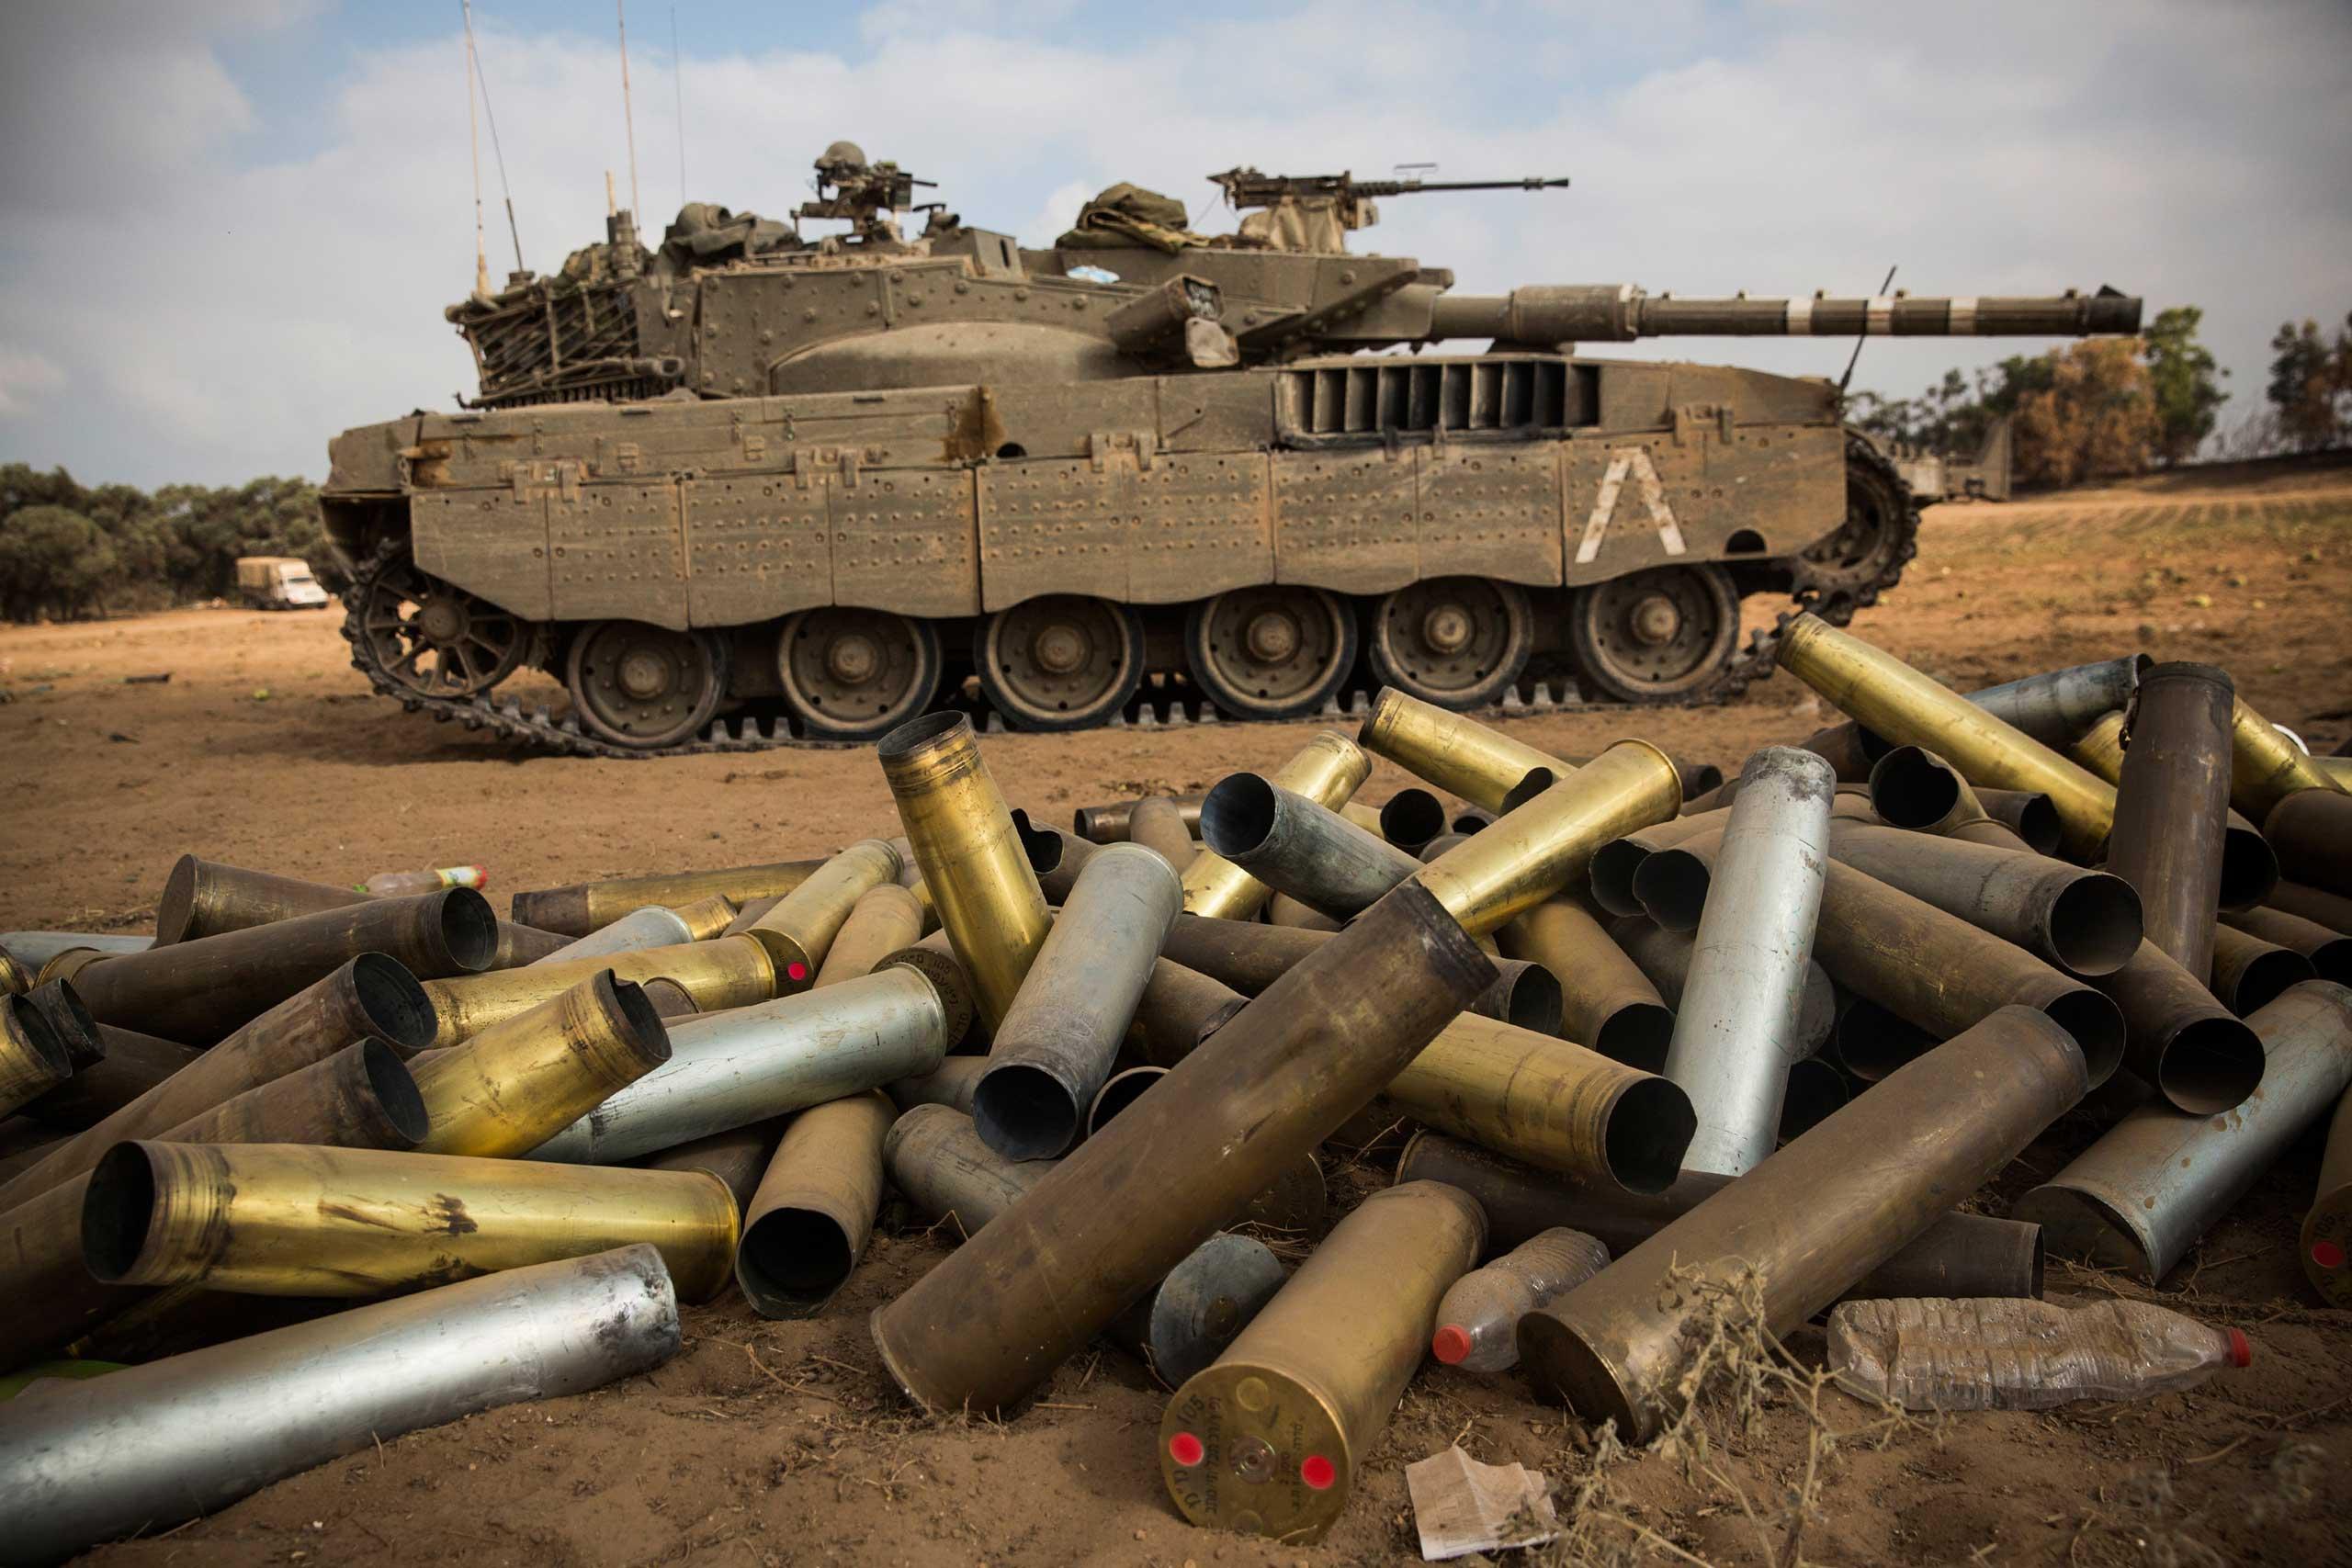 Used artillery shells litter the ground near Kfar Aza, Israel, on the morning of July 28, 2014.